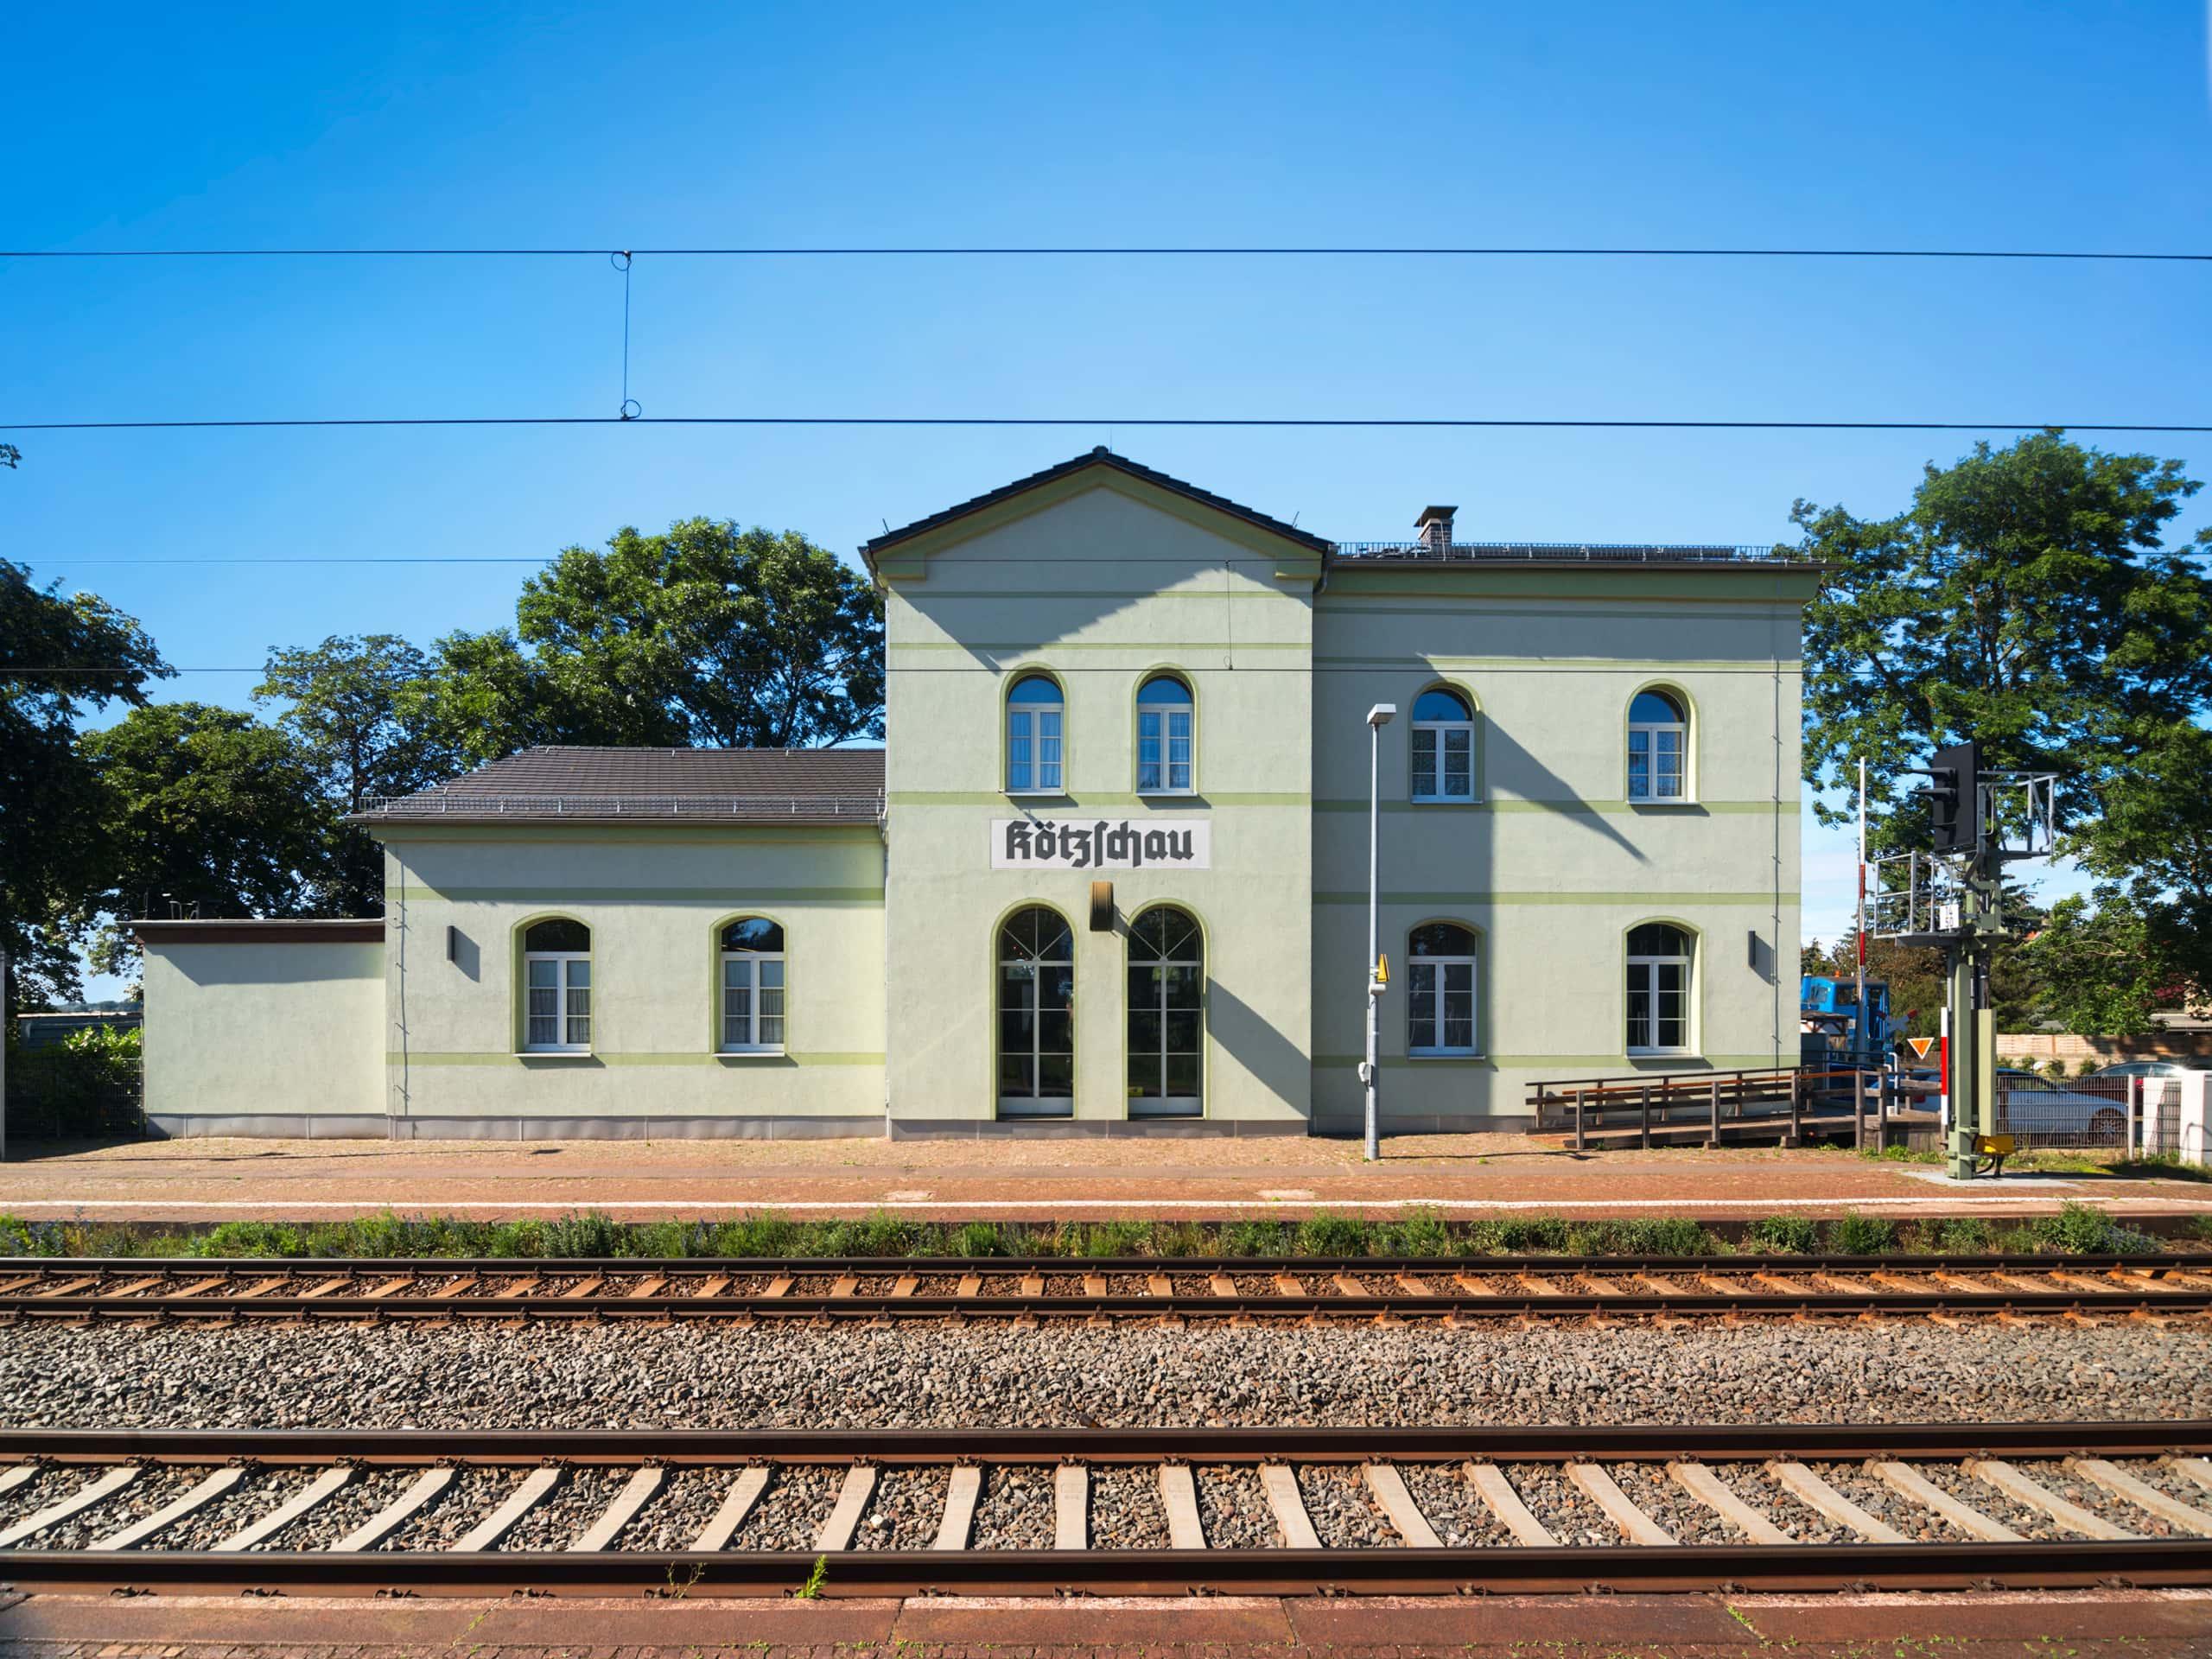 Industriekultur – Eisenbahnmuseum Kötzschau